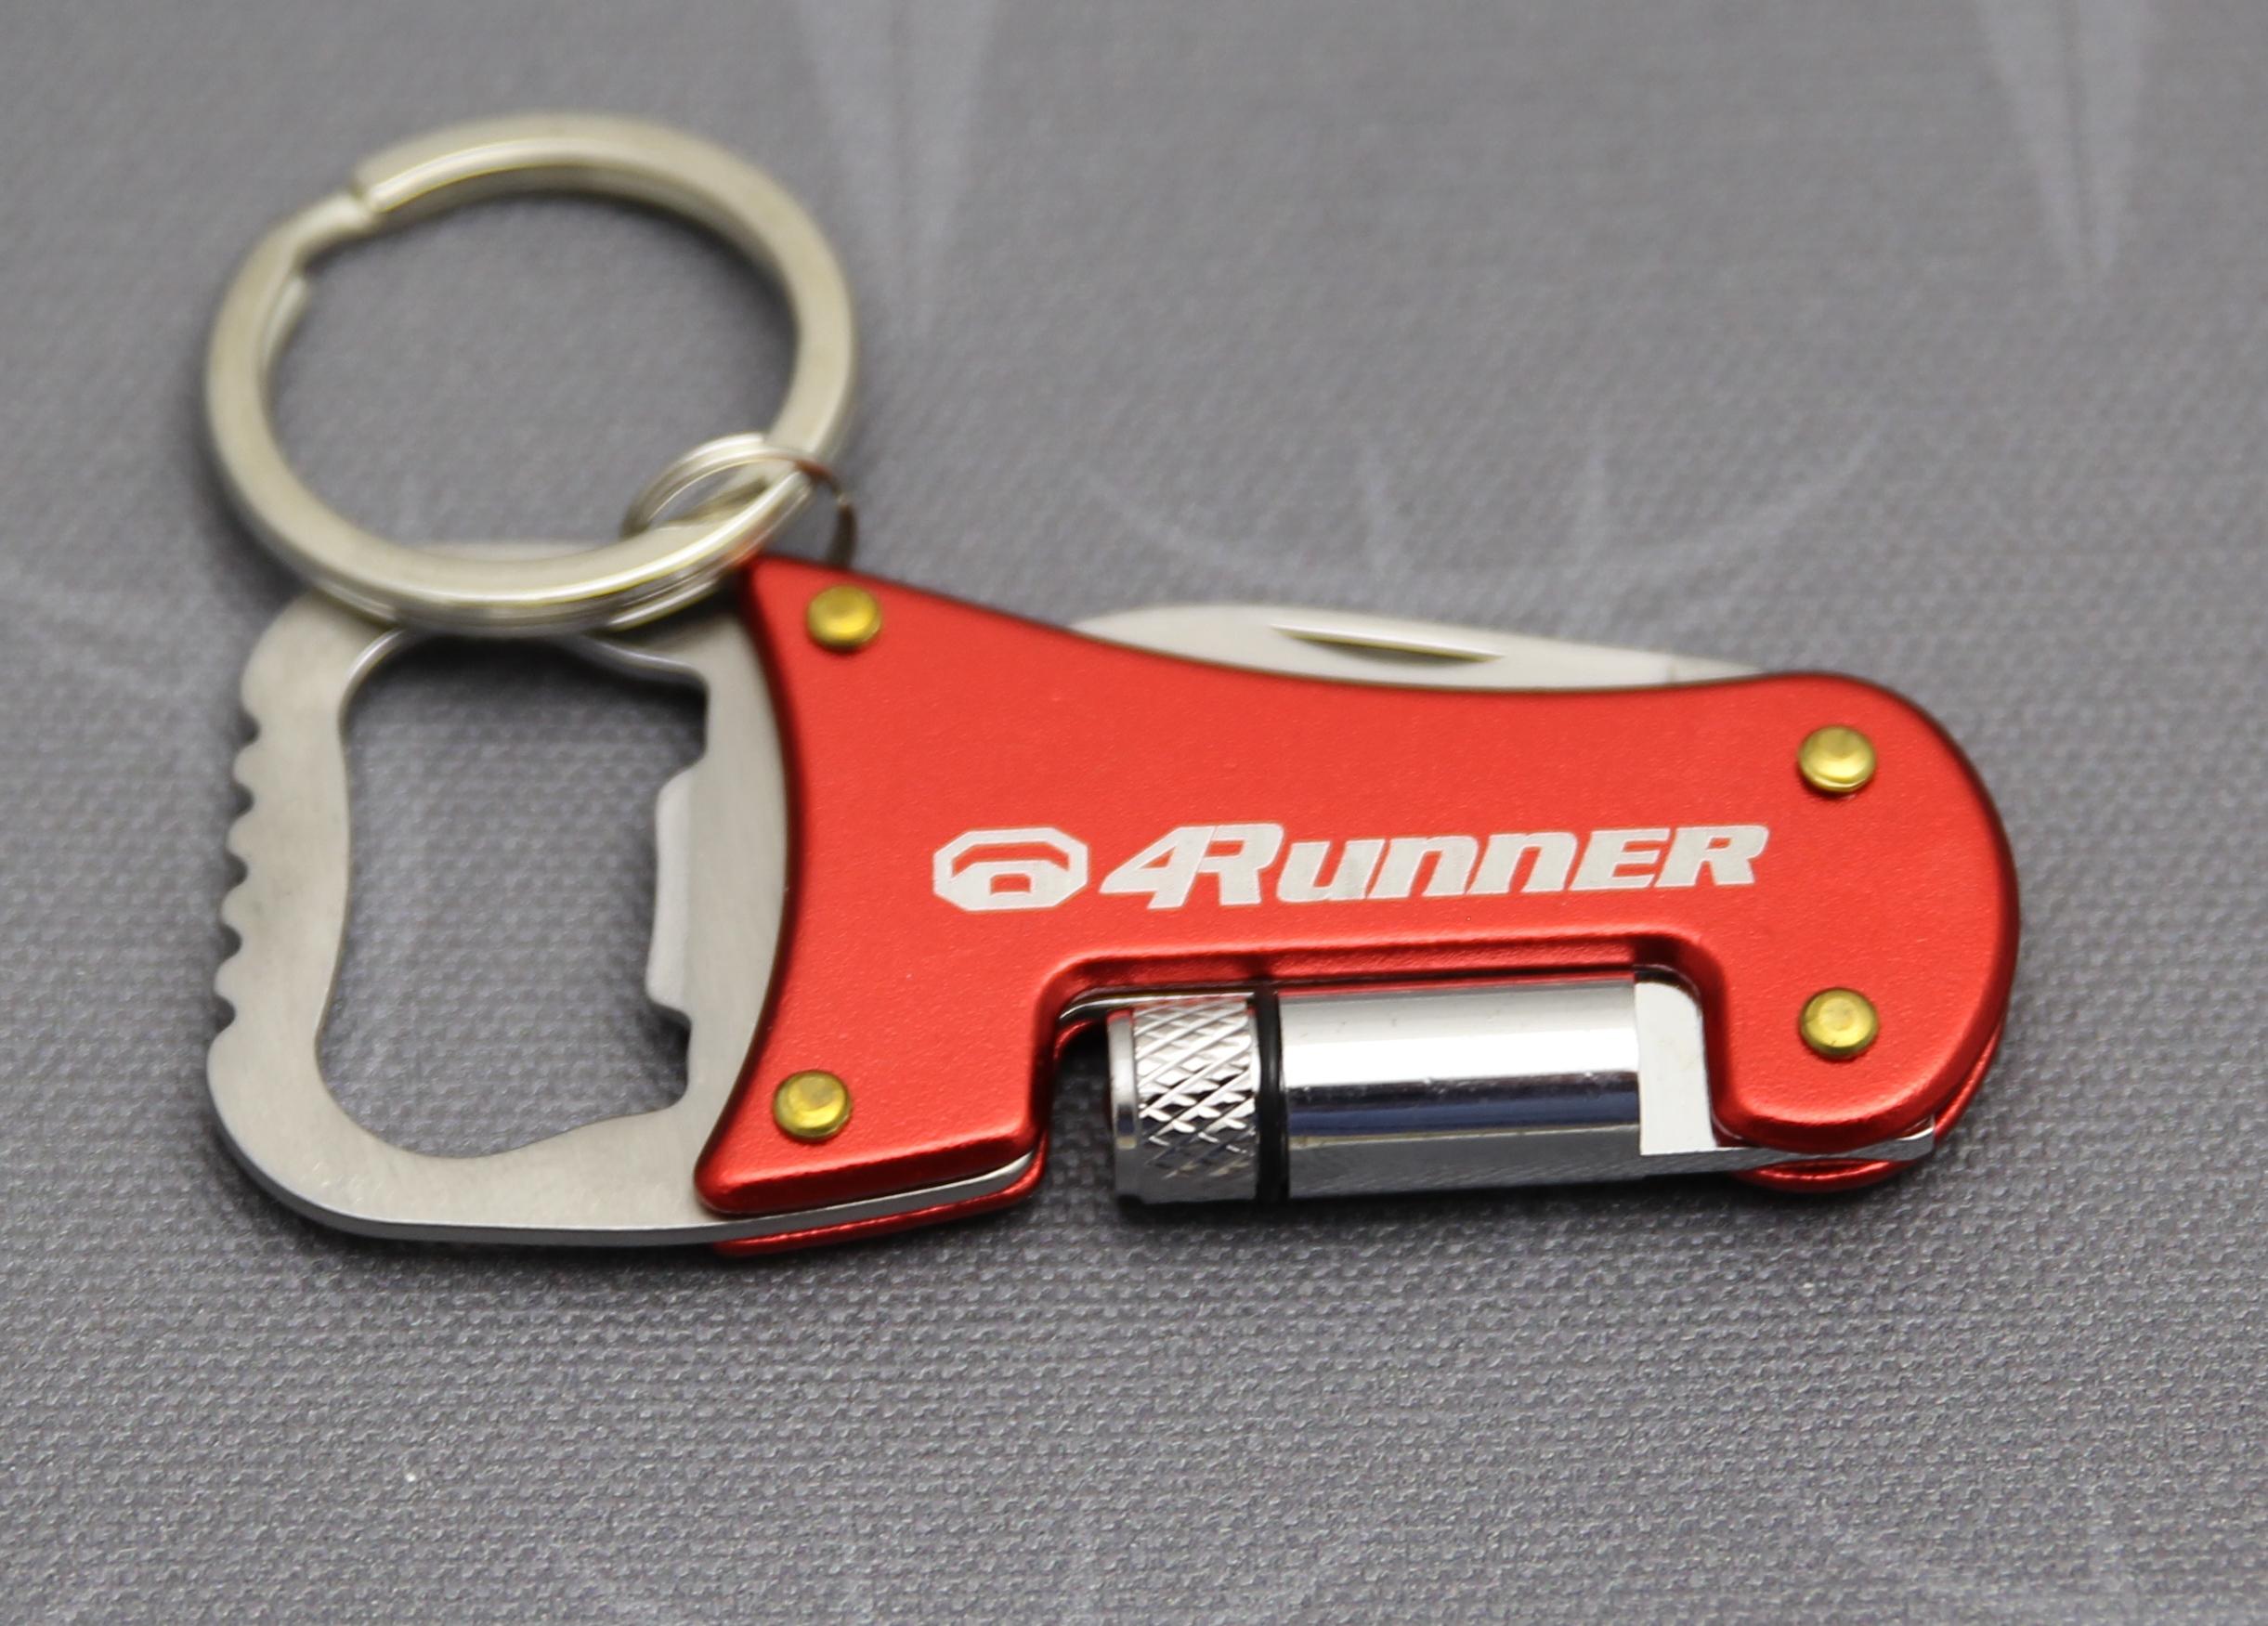 a7cb5a5add Toyota 4Runner Keychain Flashlight Box Opener Bottle Opener - Taco ...